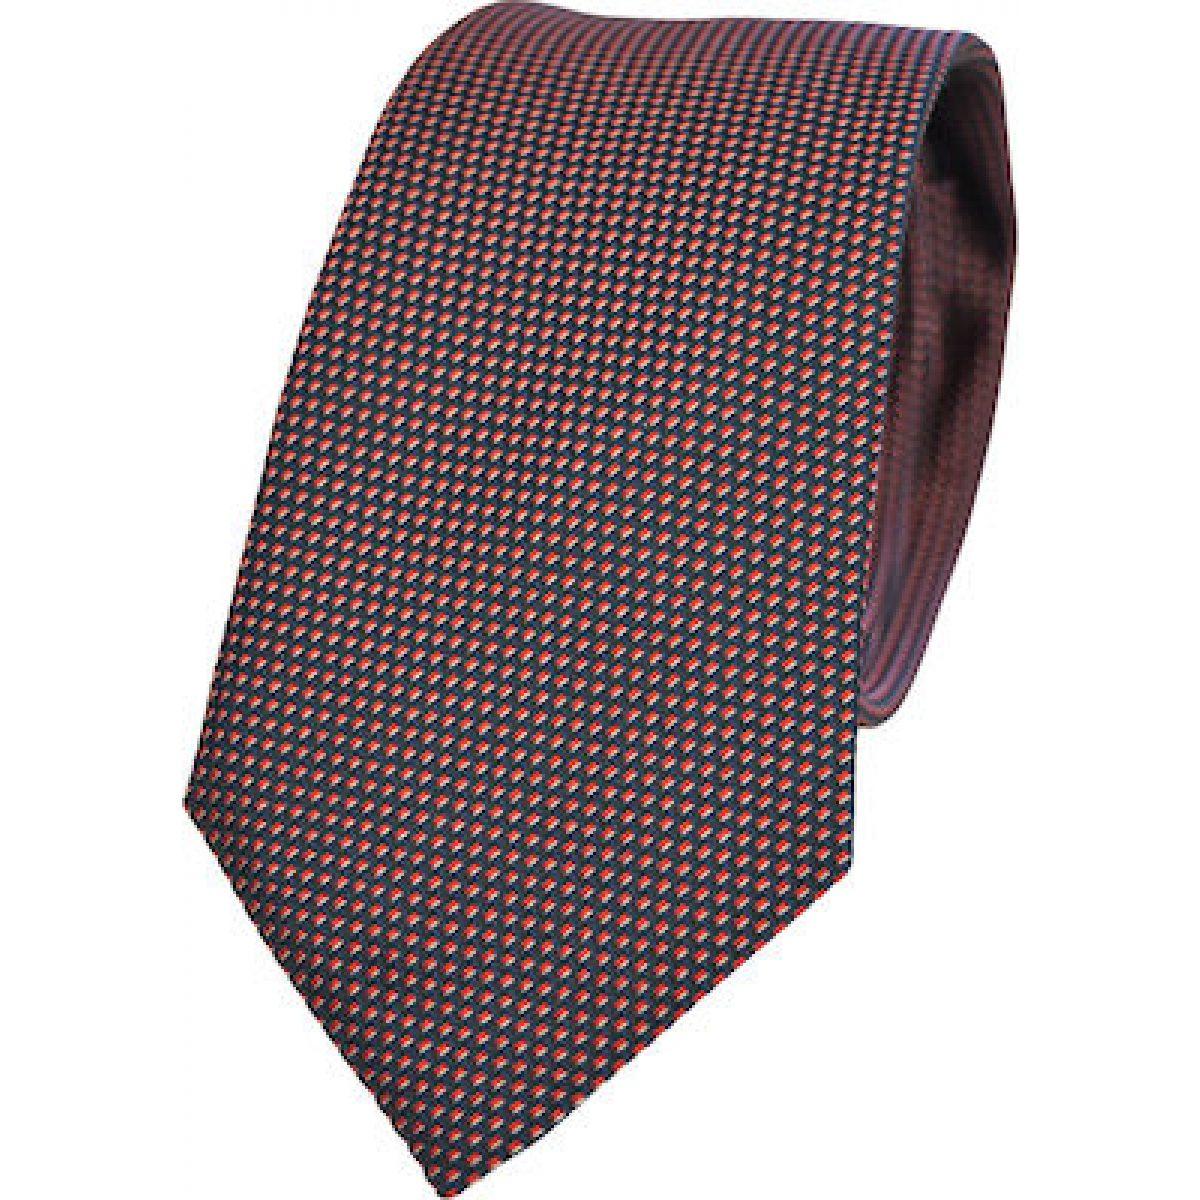 xlarge 20210913124730 hugo boss andriki gravata metaxoti me schedia se kokkino chroma 50458530 693